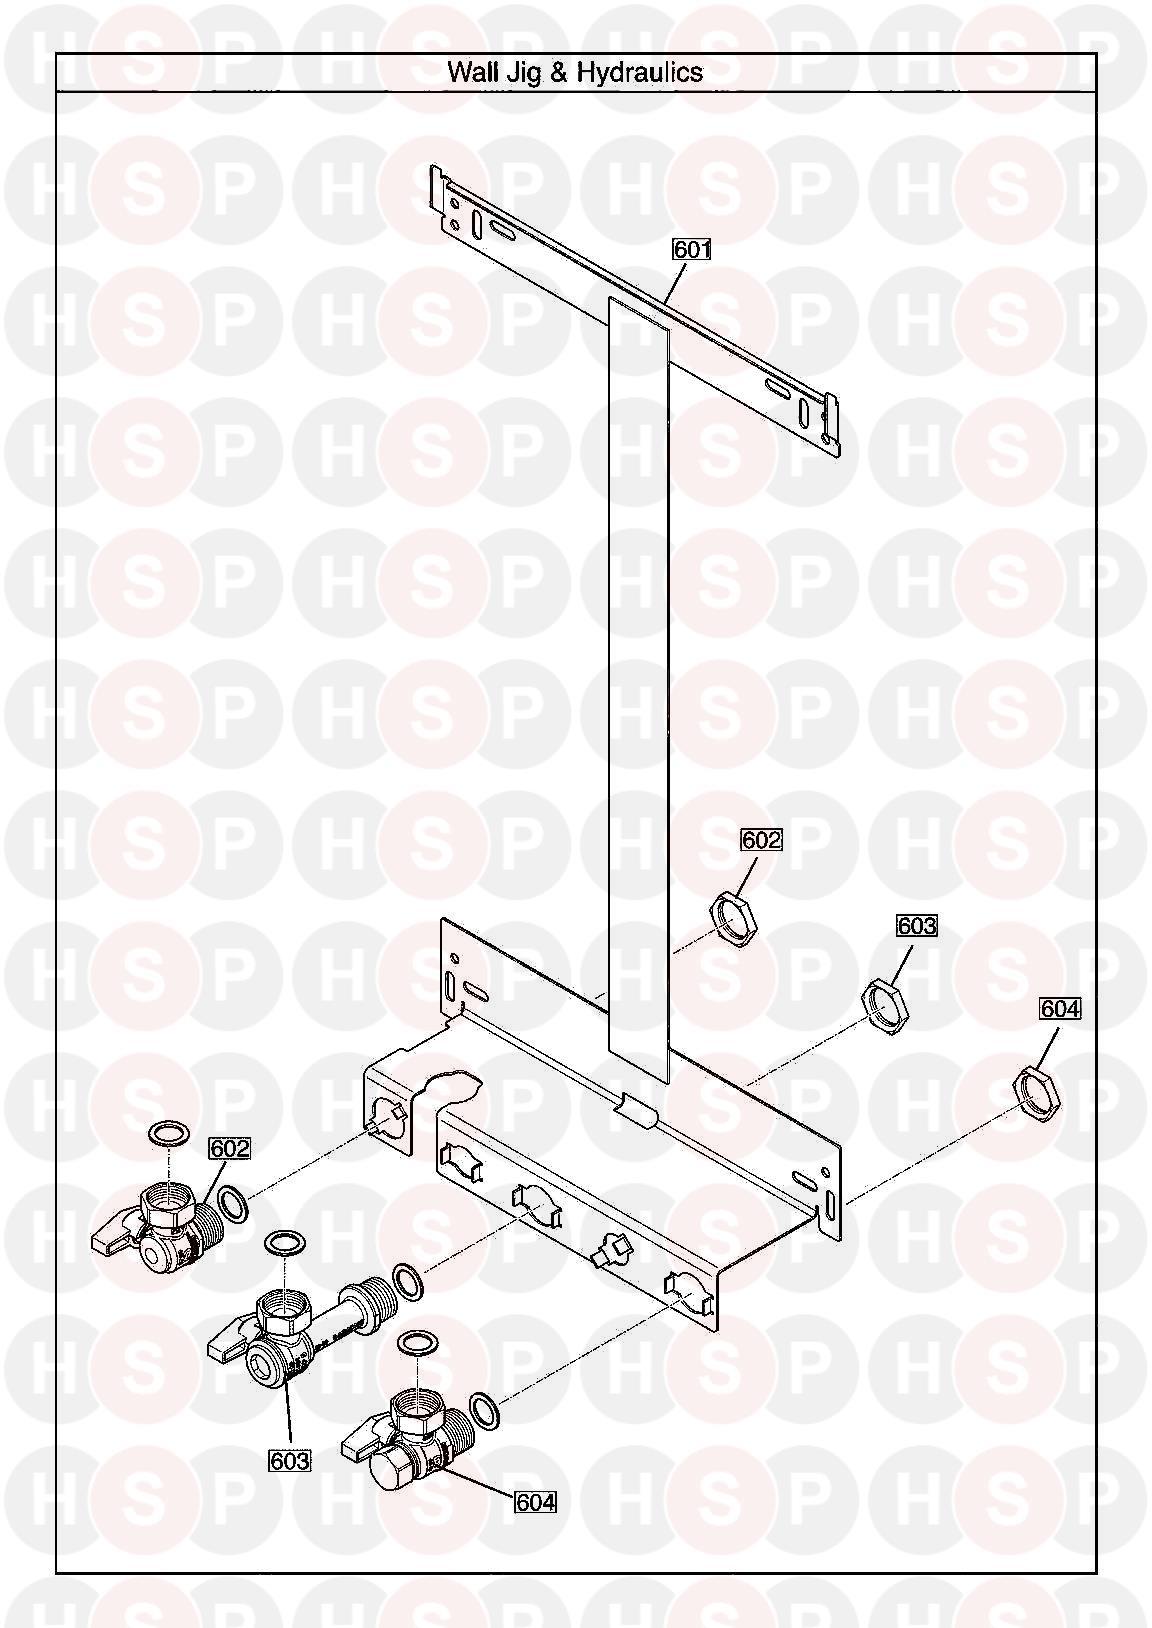 baxi megaflo 2 system 24 compact ga  wall jig  diagram